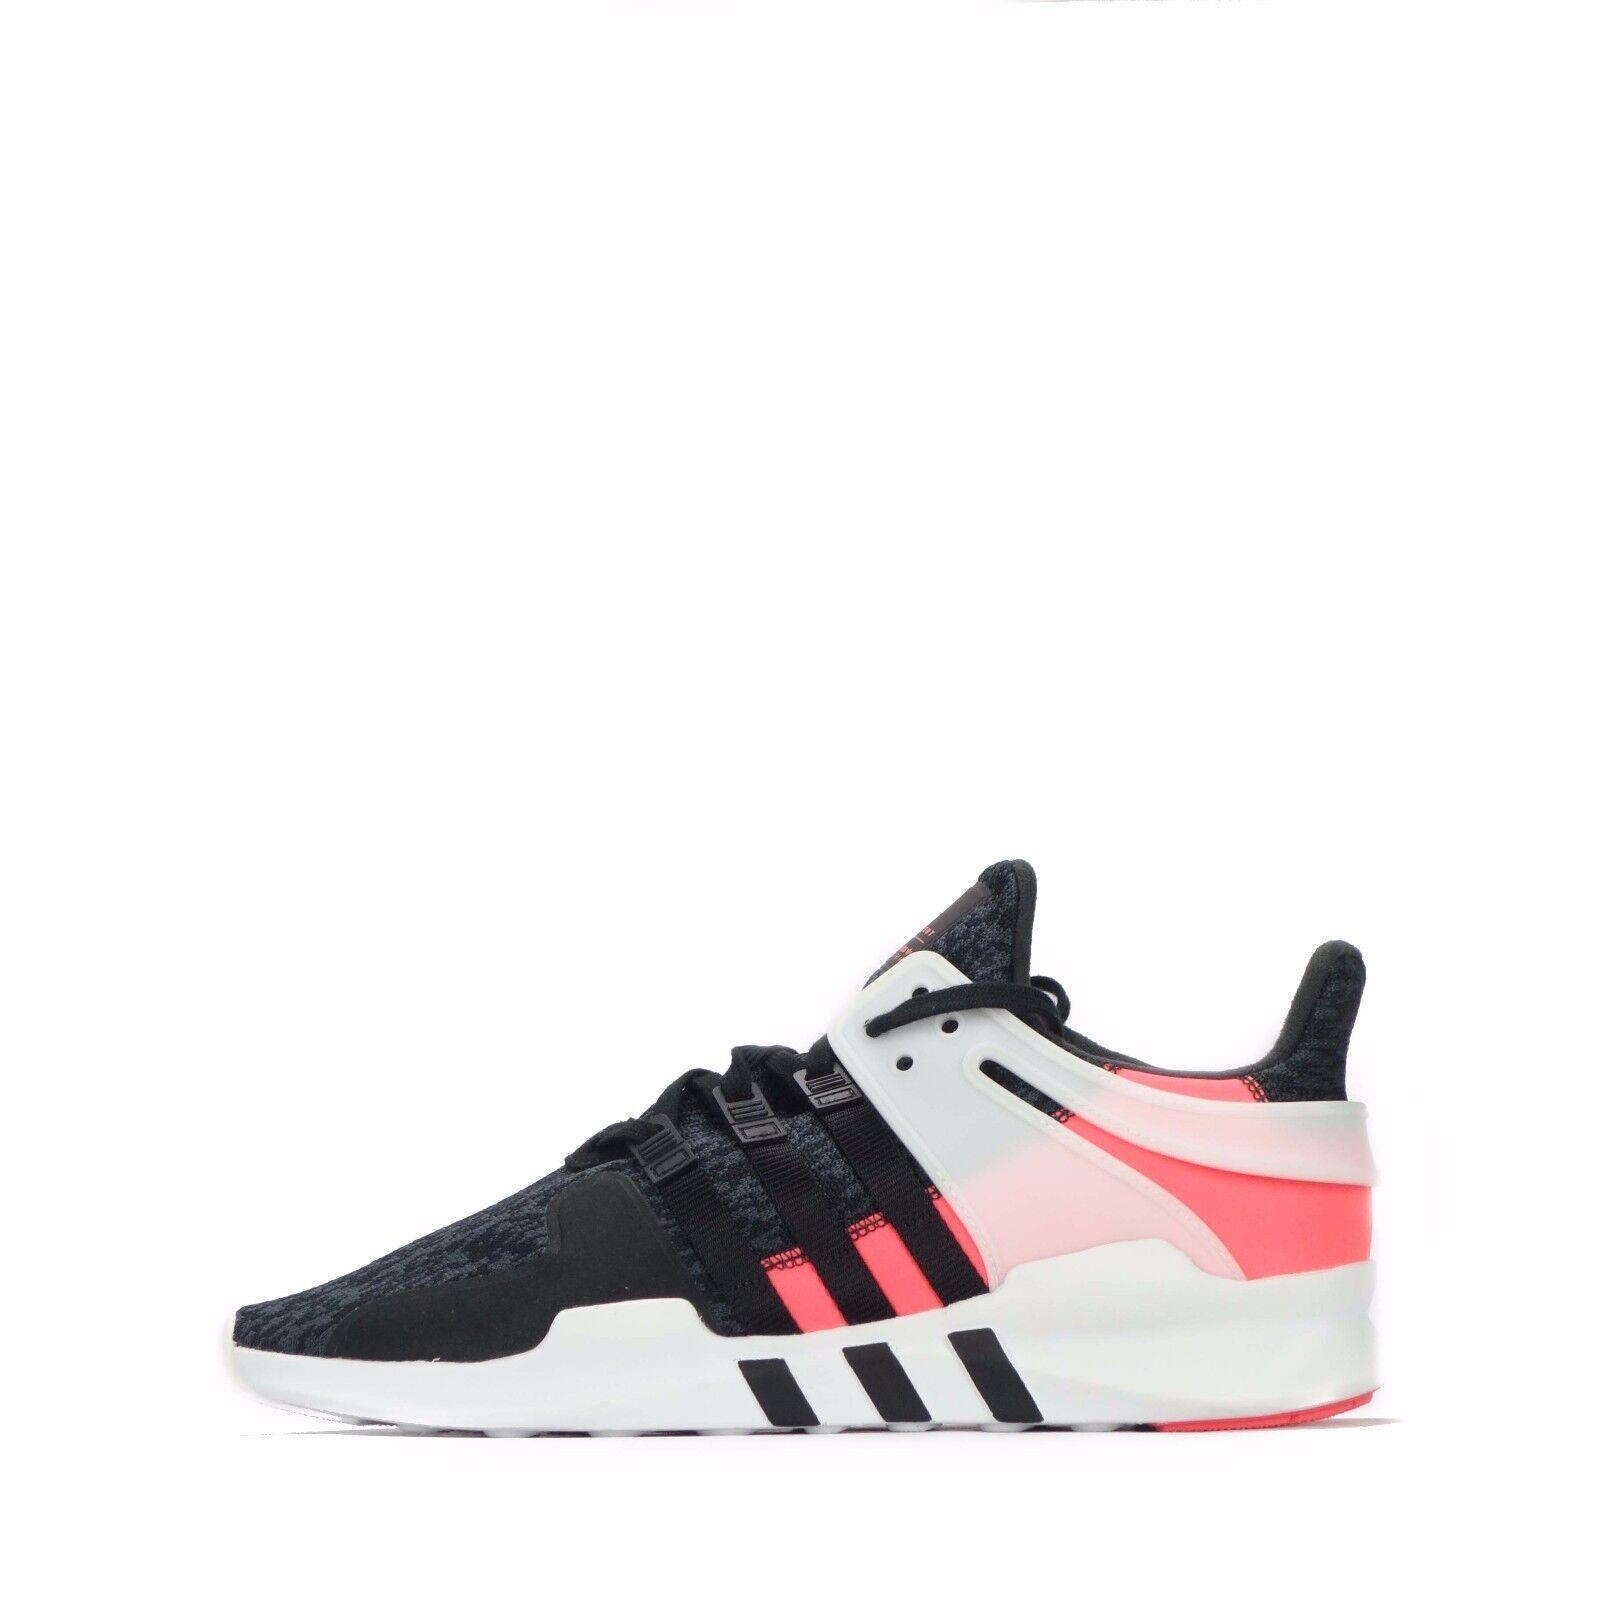 Adidas ADV Originals EQT Support ADV Adidas para Hombre Zapatos Negro 6bc607